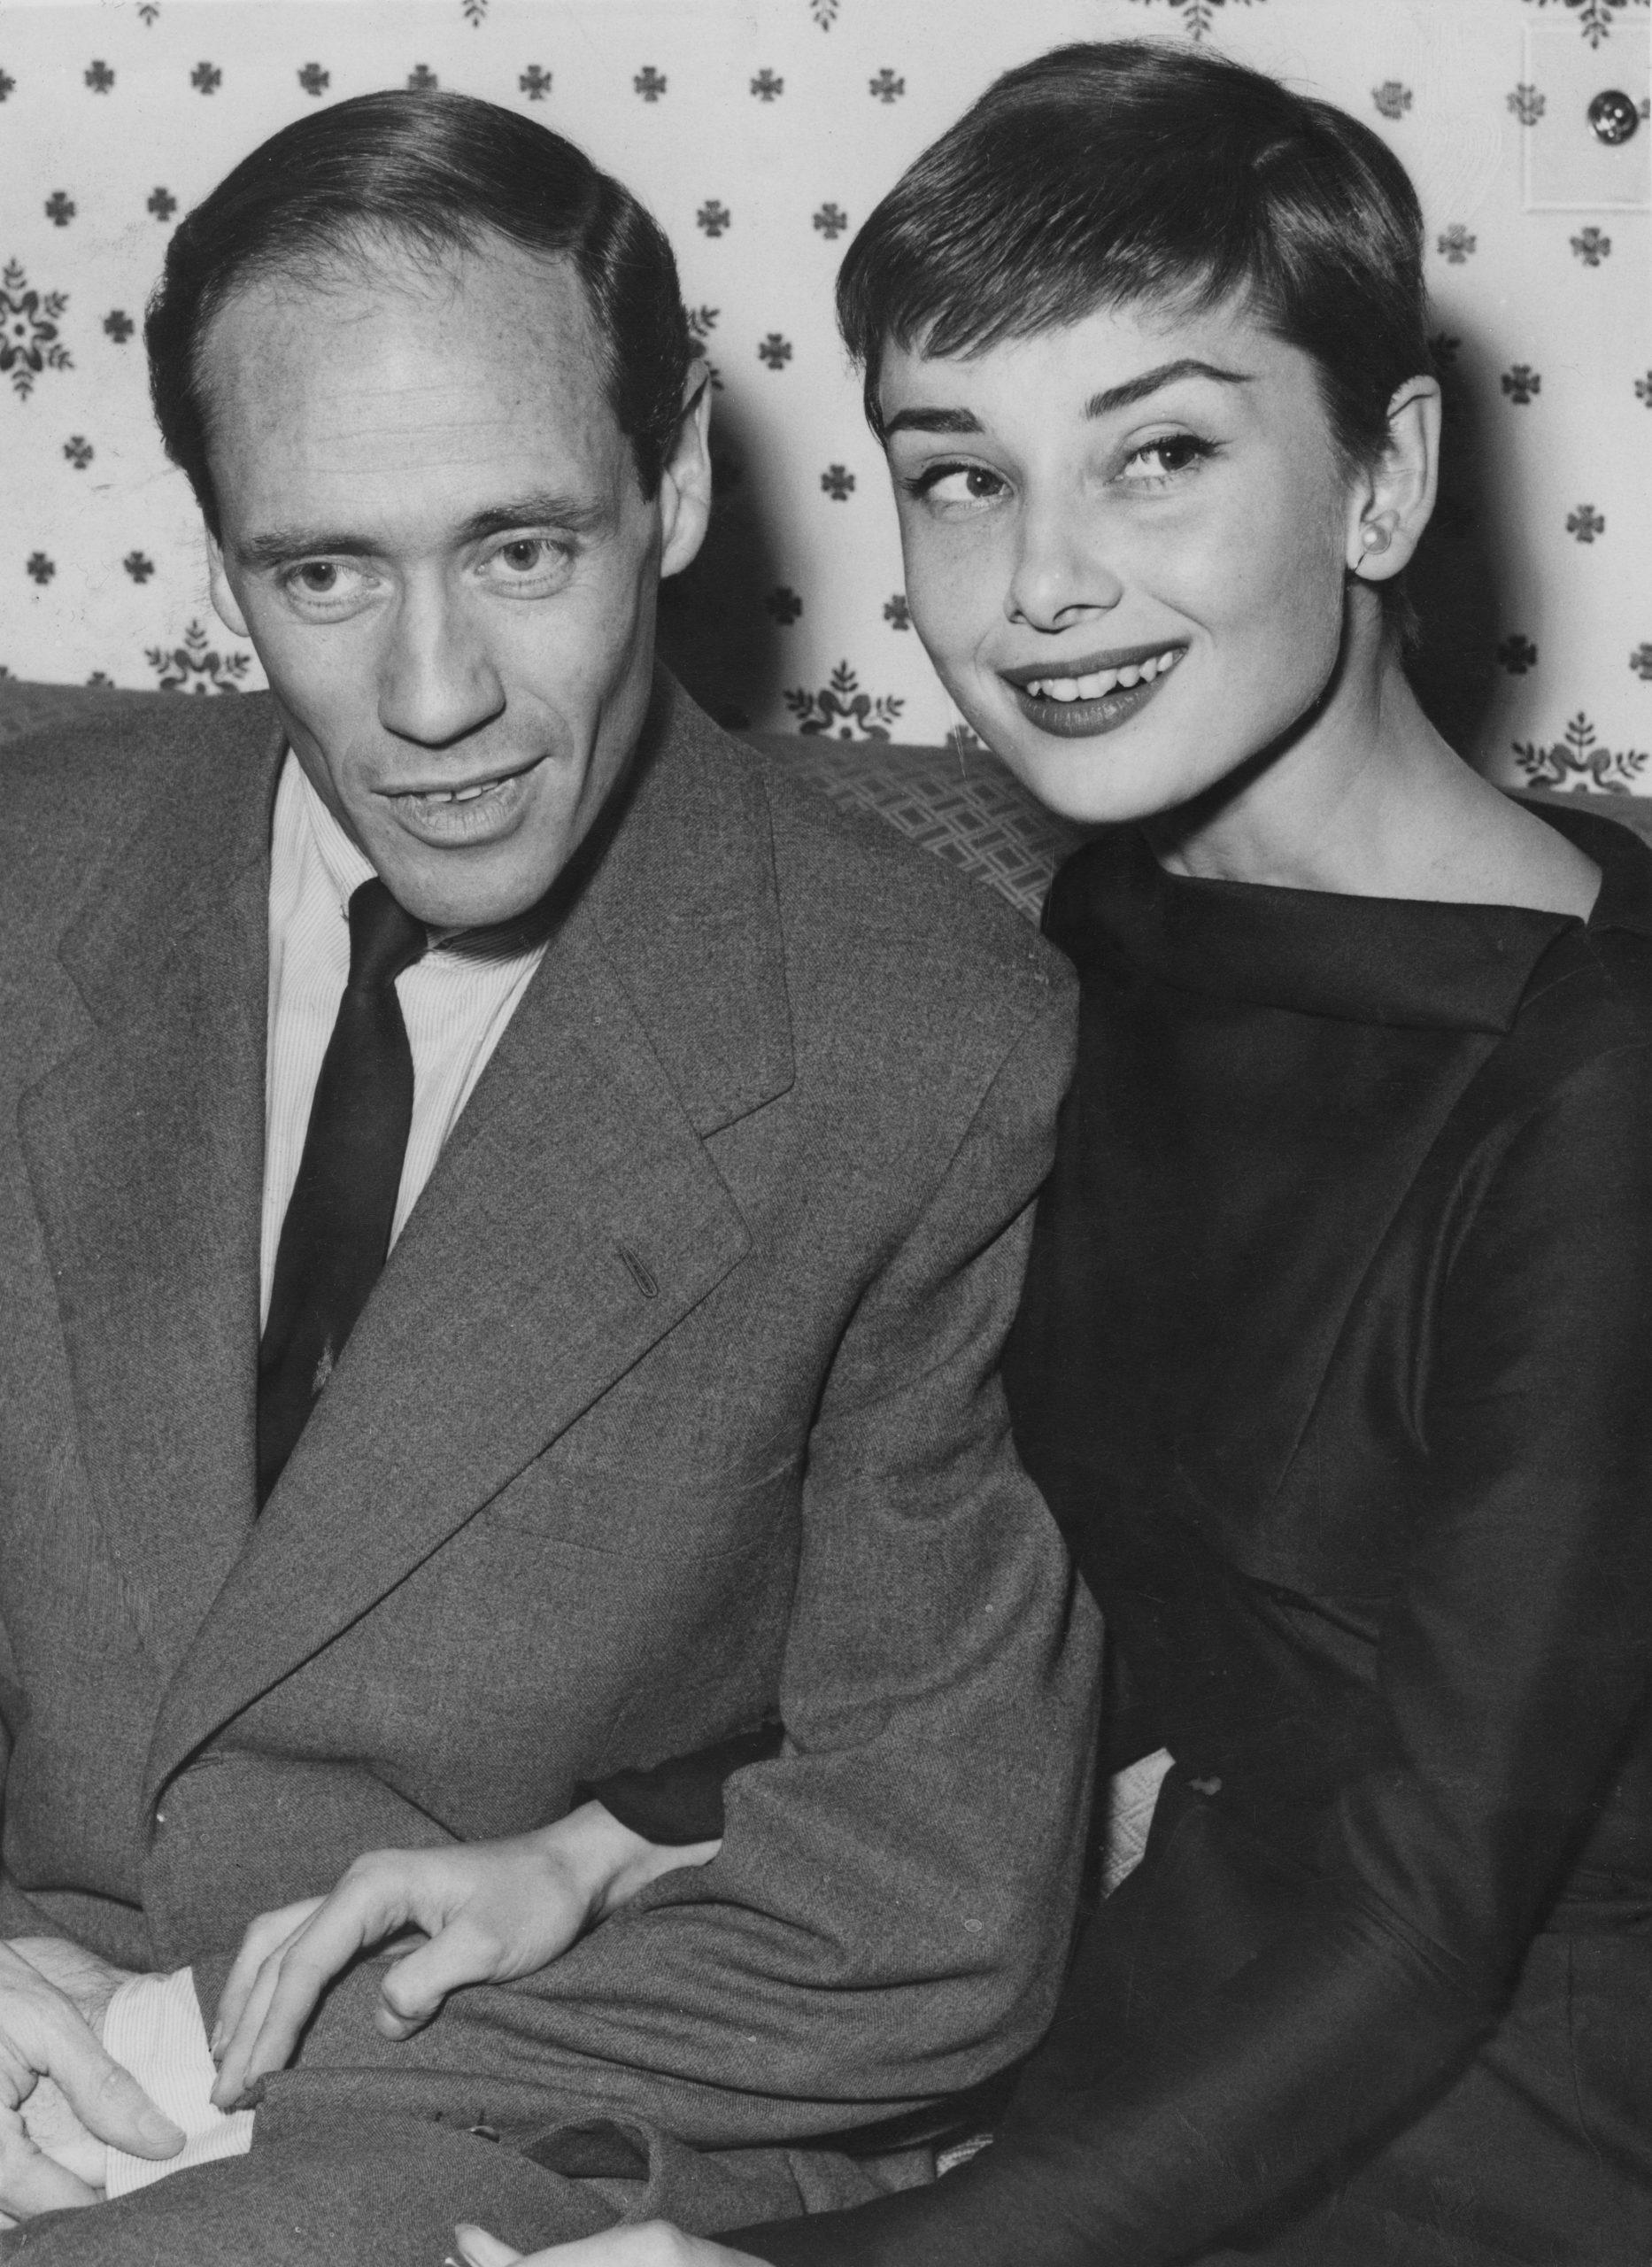 Audrey Hepburn y Mel Ferrer en 1954 / Foto: Getty Images